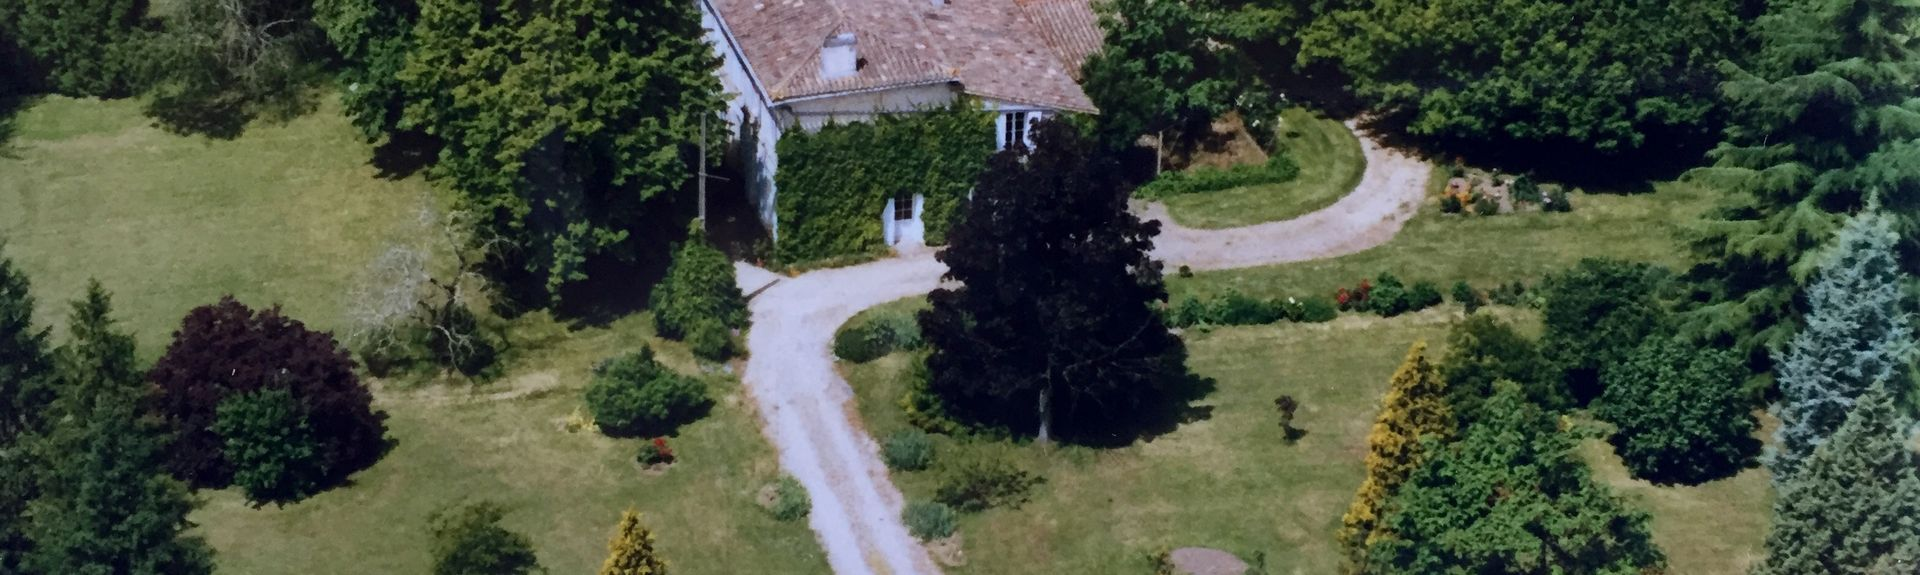 Neac, Gironde (department), France